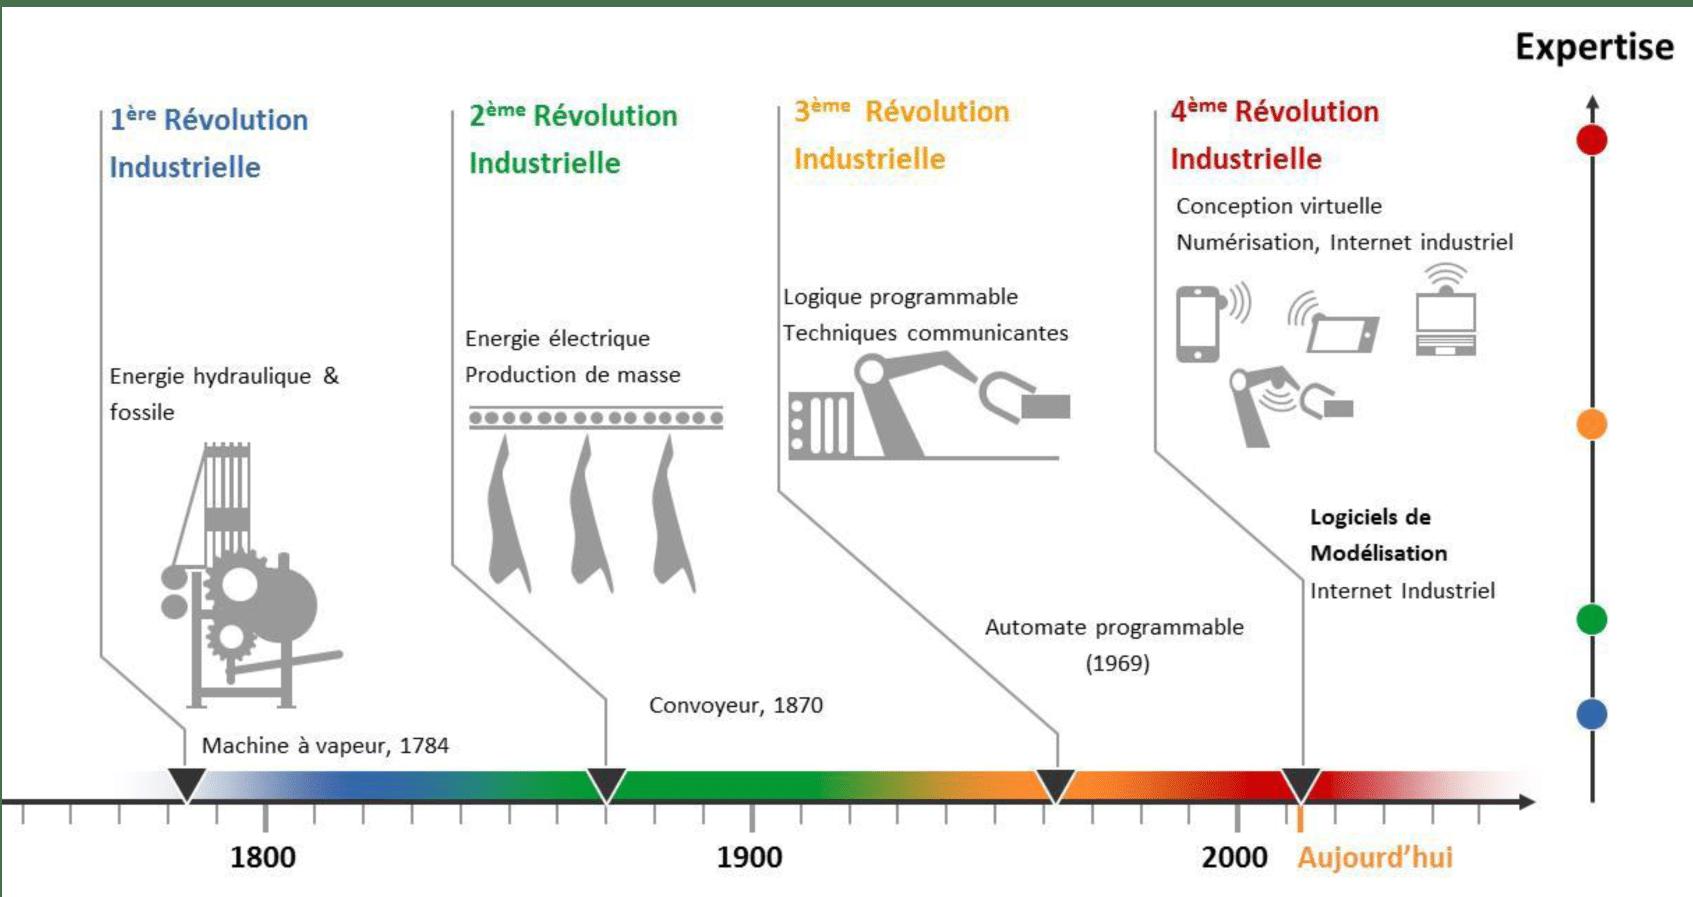 Schéma illustrant les révolutions industrielles